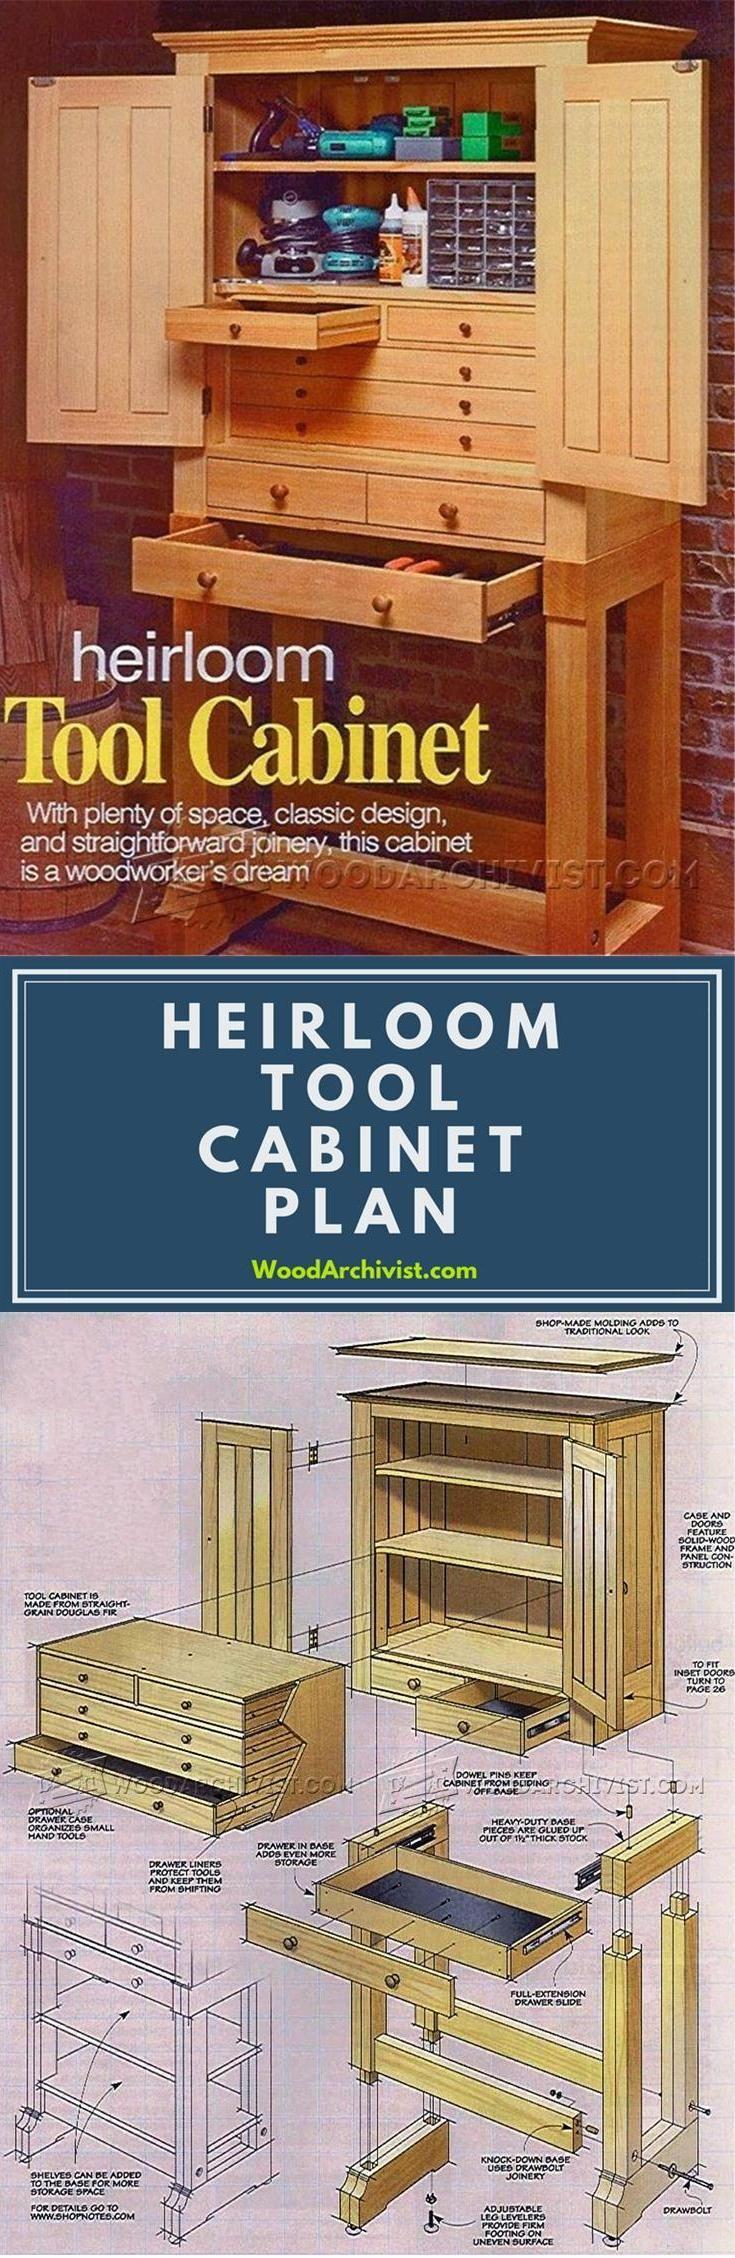 Heirloom Tool Cabinet Plans - Workshop Solutions Plans, Tips and Tricks | WoodArchivist.com